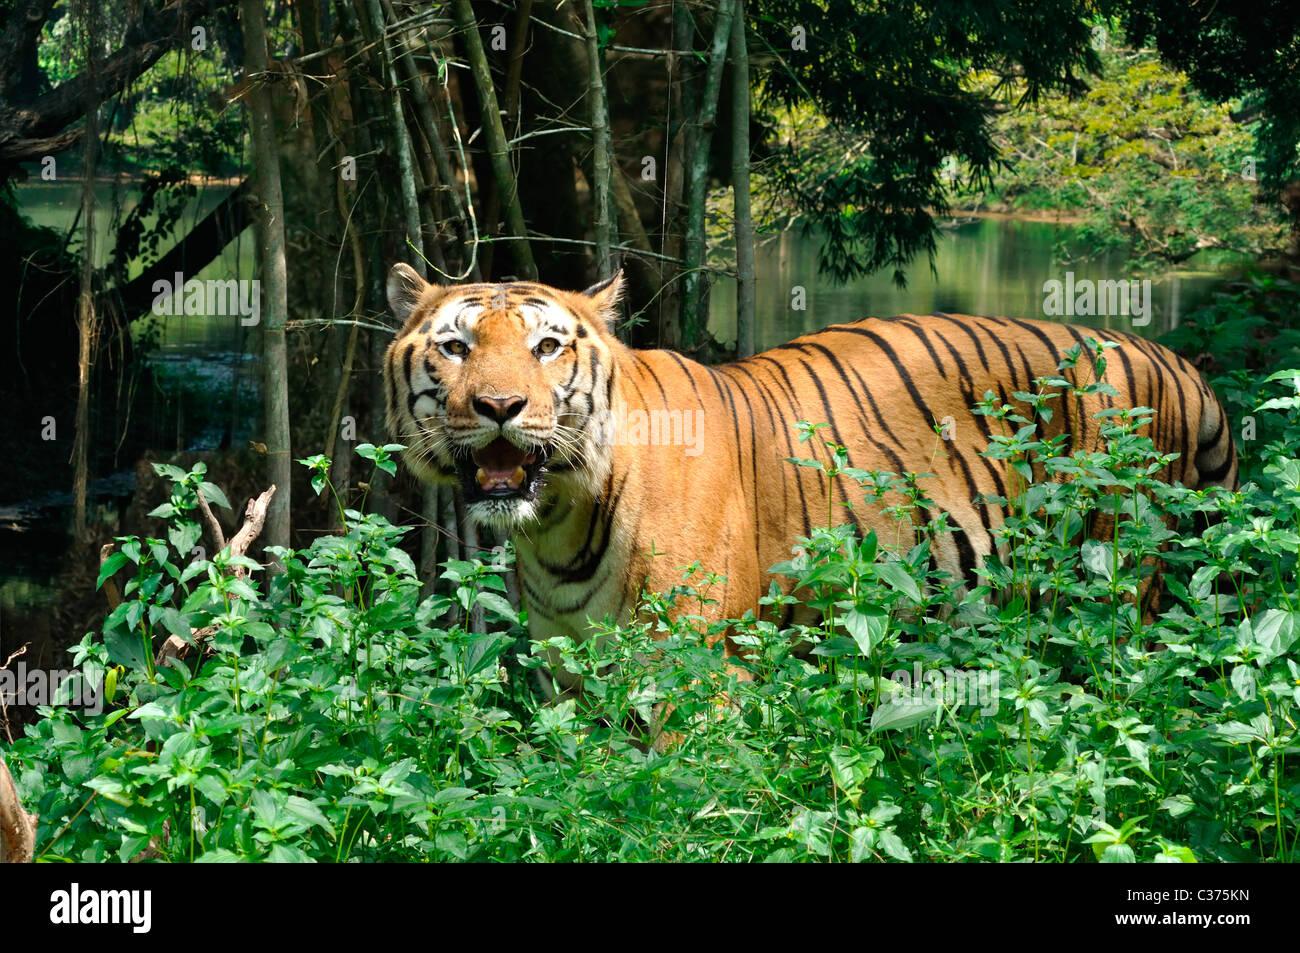 Tigre indiana Immagini Stock